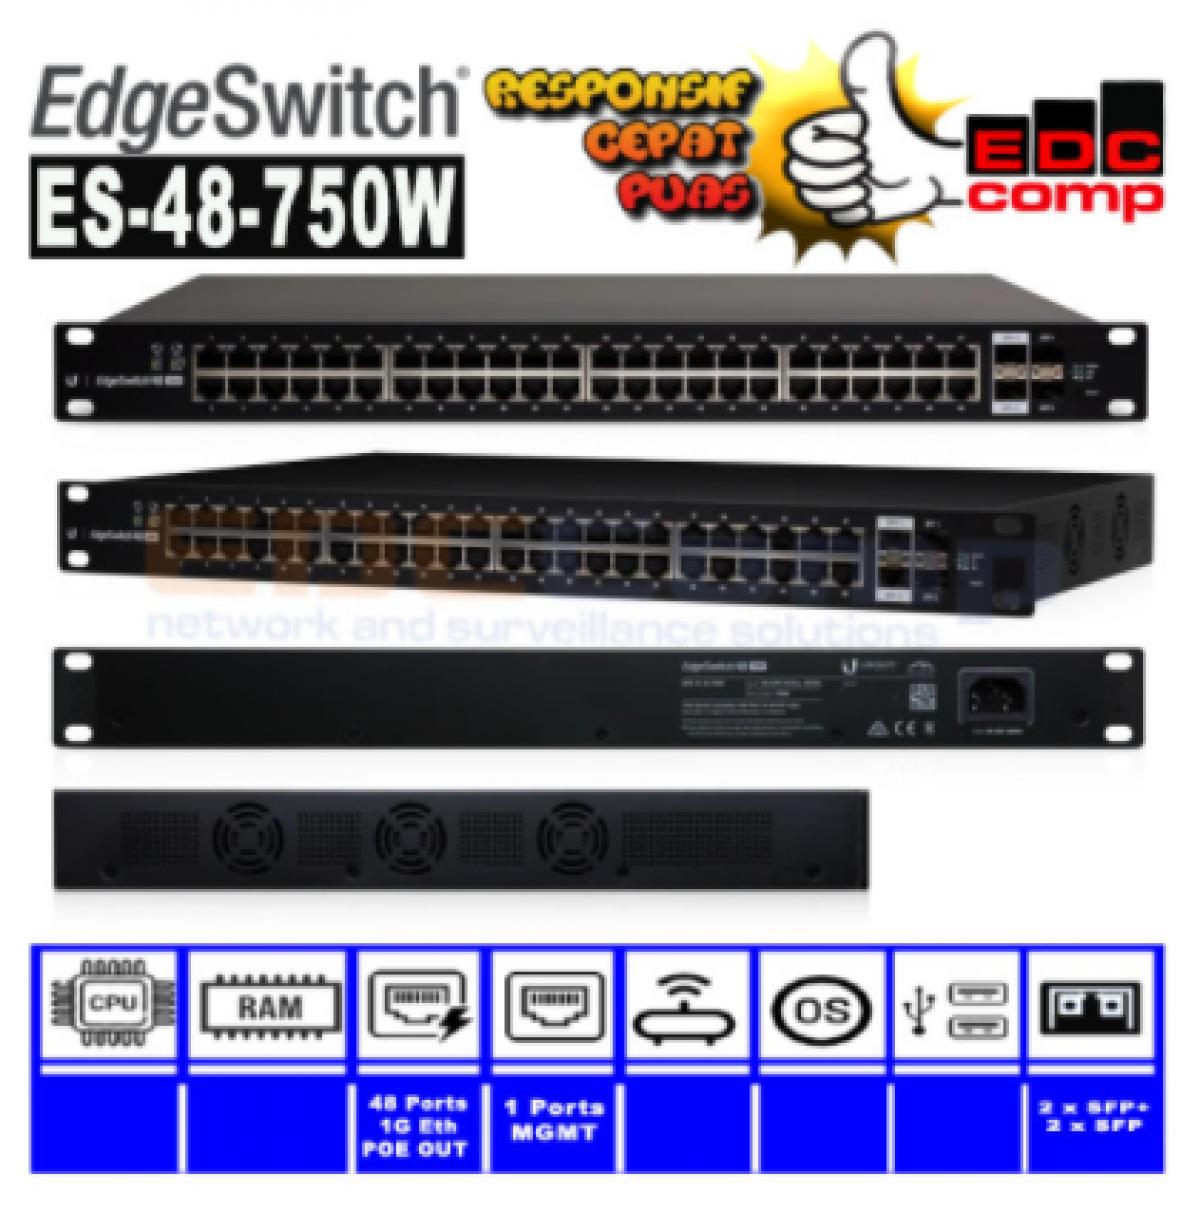 Ubiquiti ES-48-750W Edge Switch PoE+ 48 Gigabit 750W with SFP - EdcComp